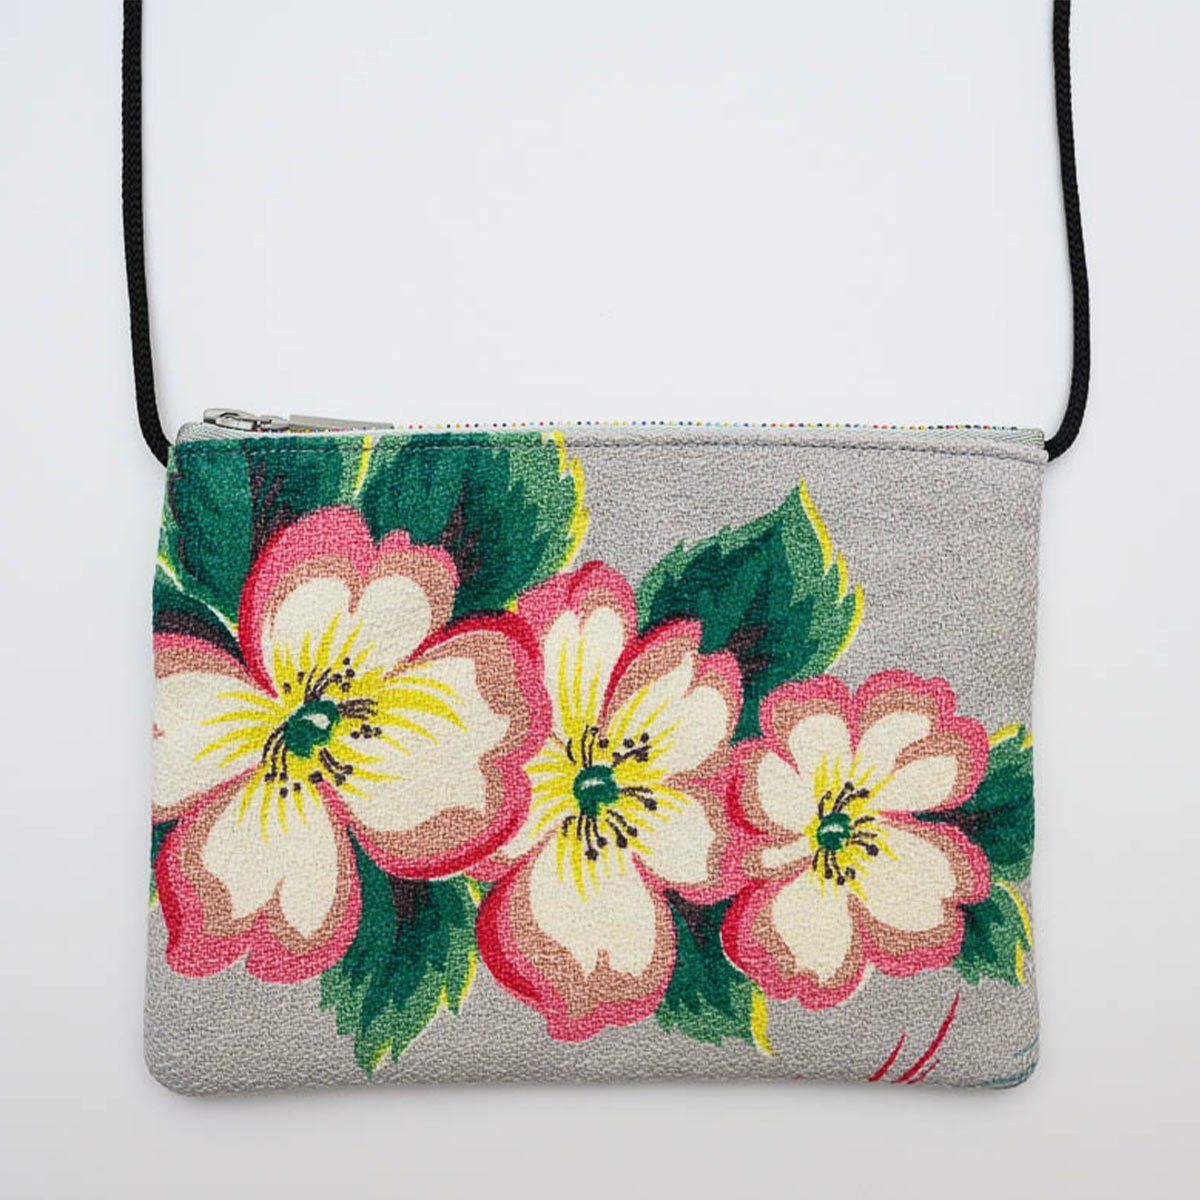 opera_bag_floral_motif_on_gray-MLP_6174